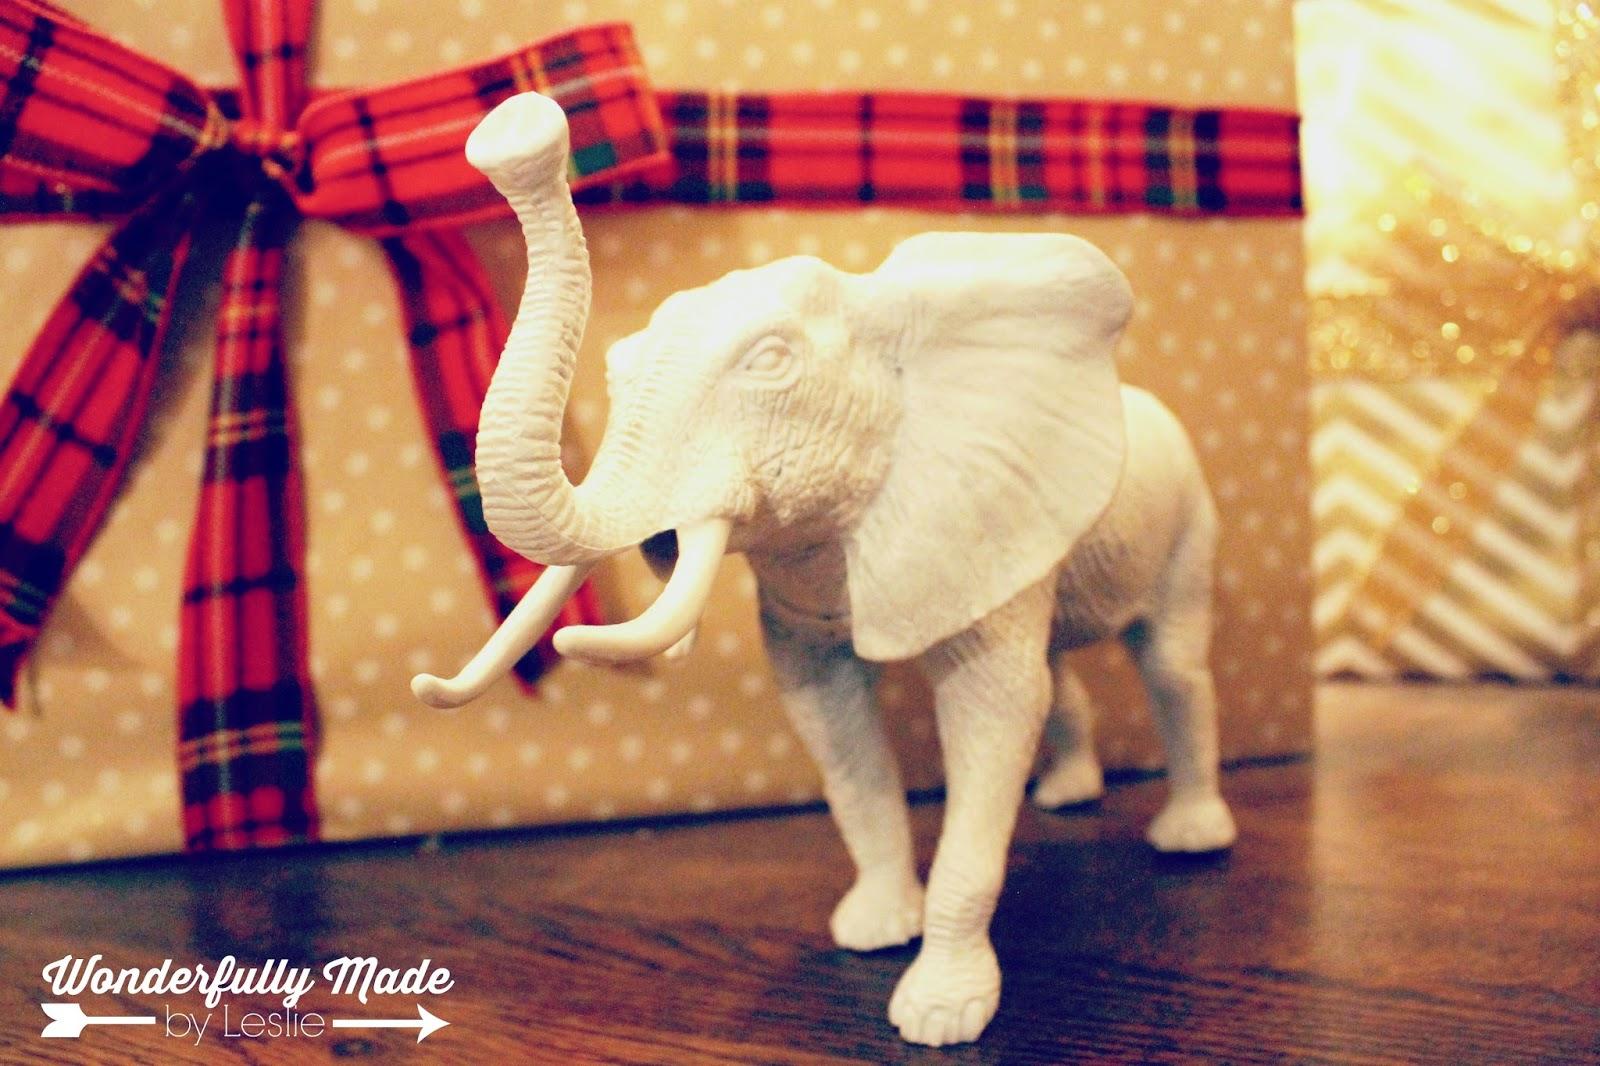 Wonderfully Made Best Ever White Elephant Gift